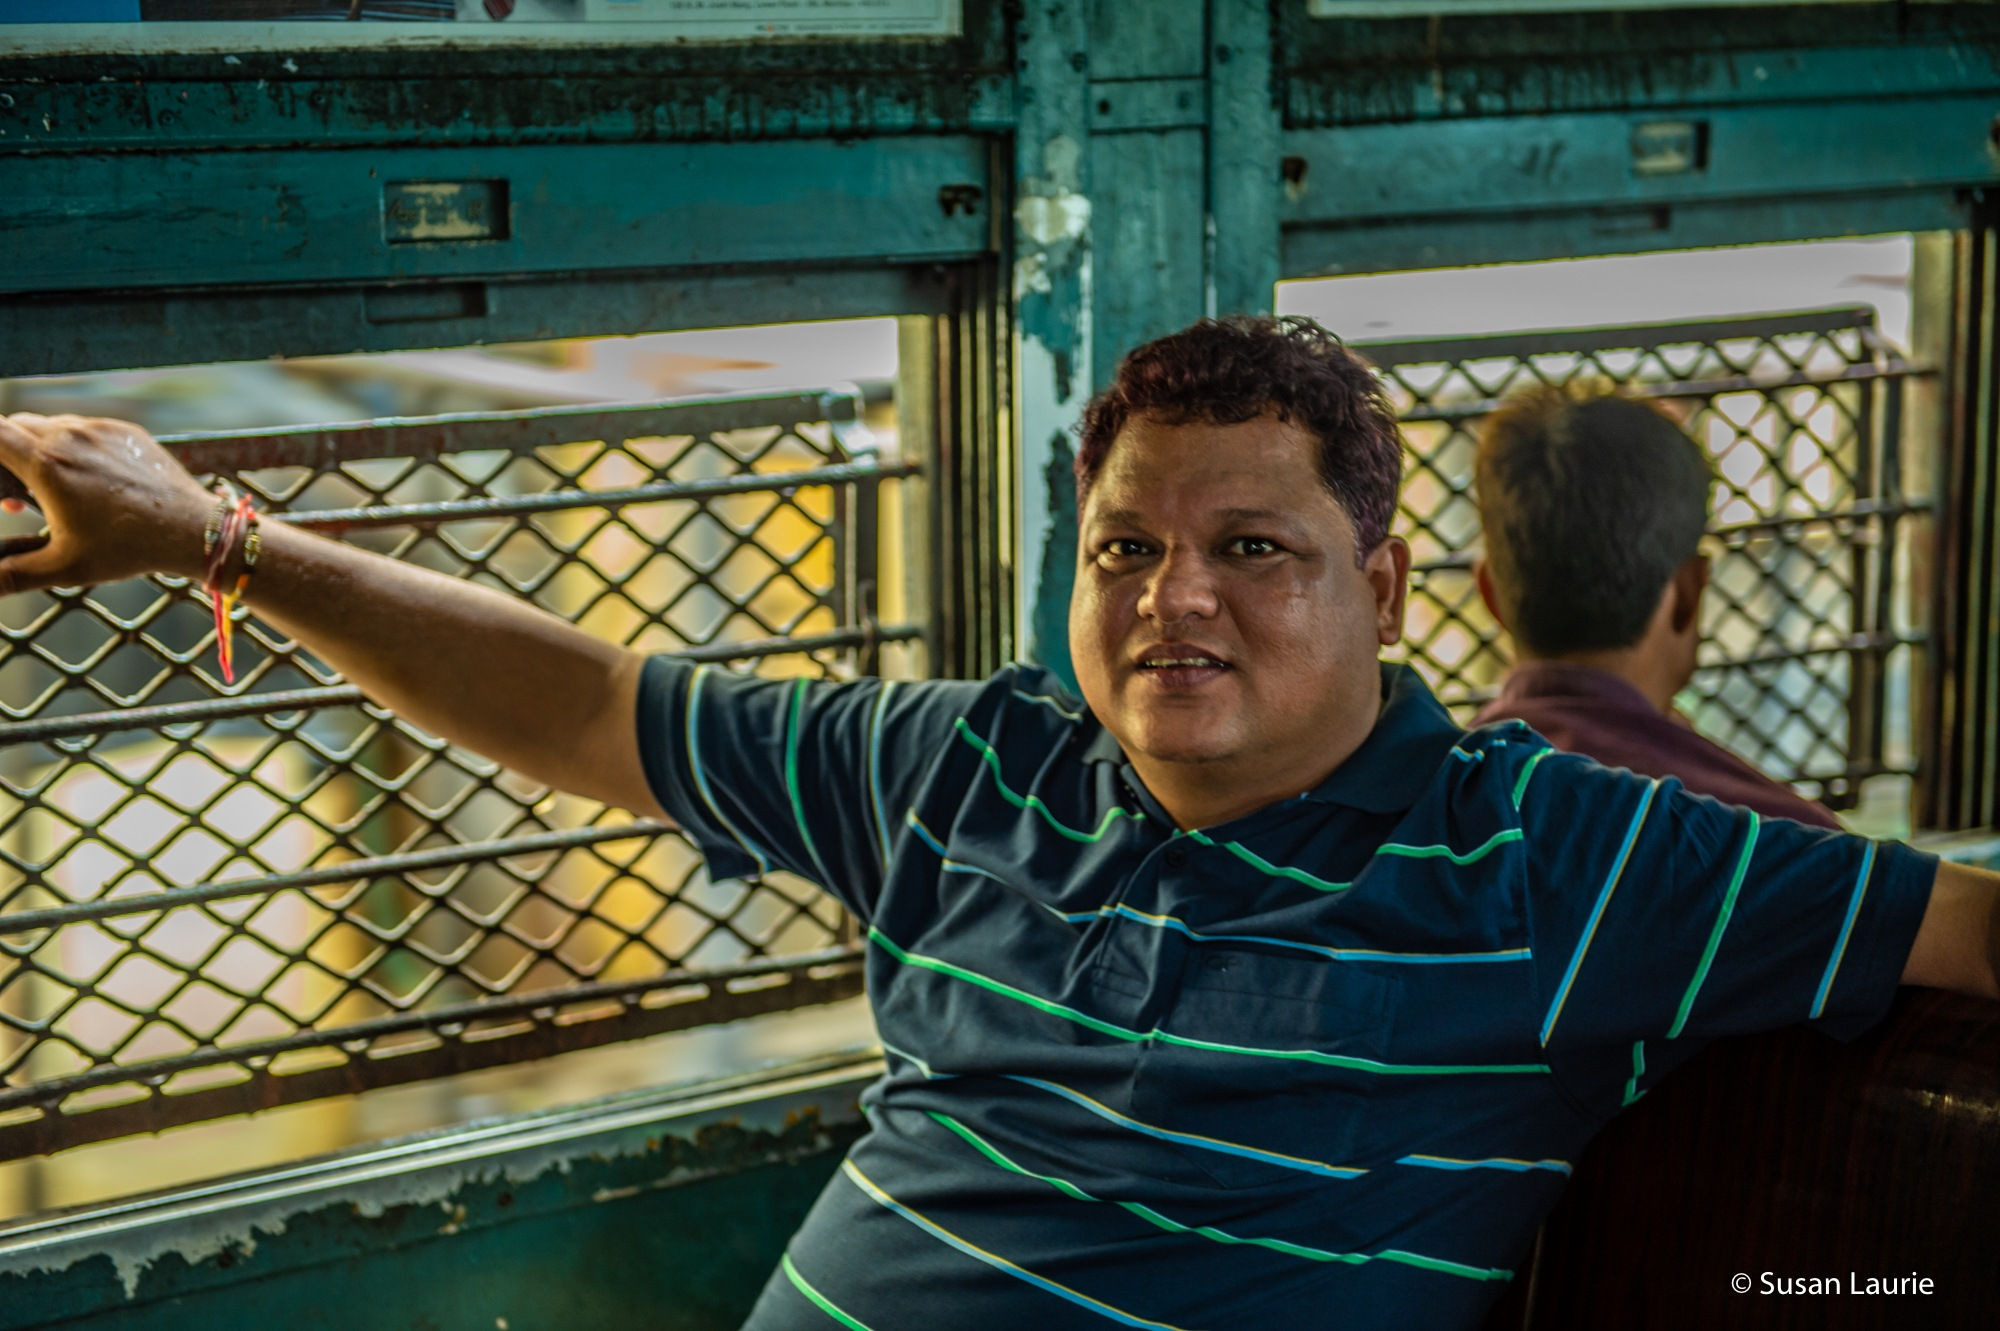 Mumbai Trains by Susan Laurie